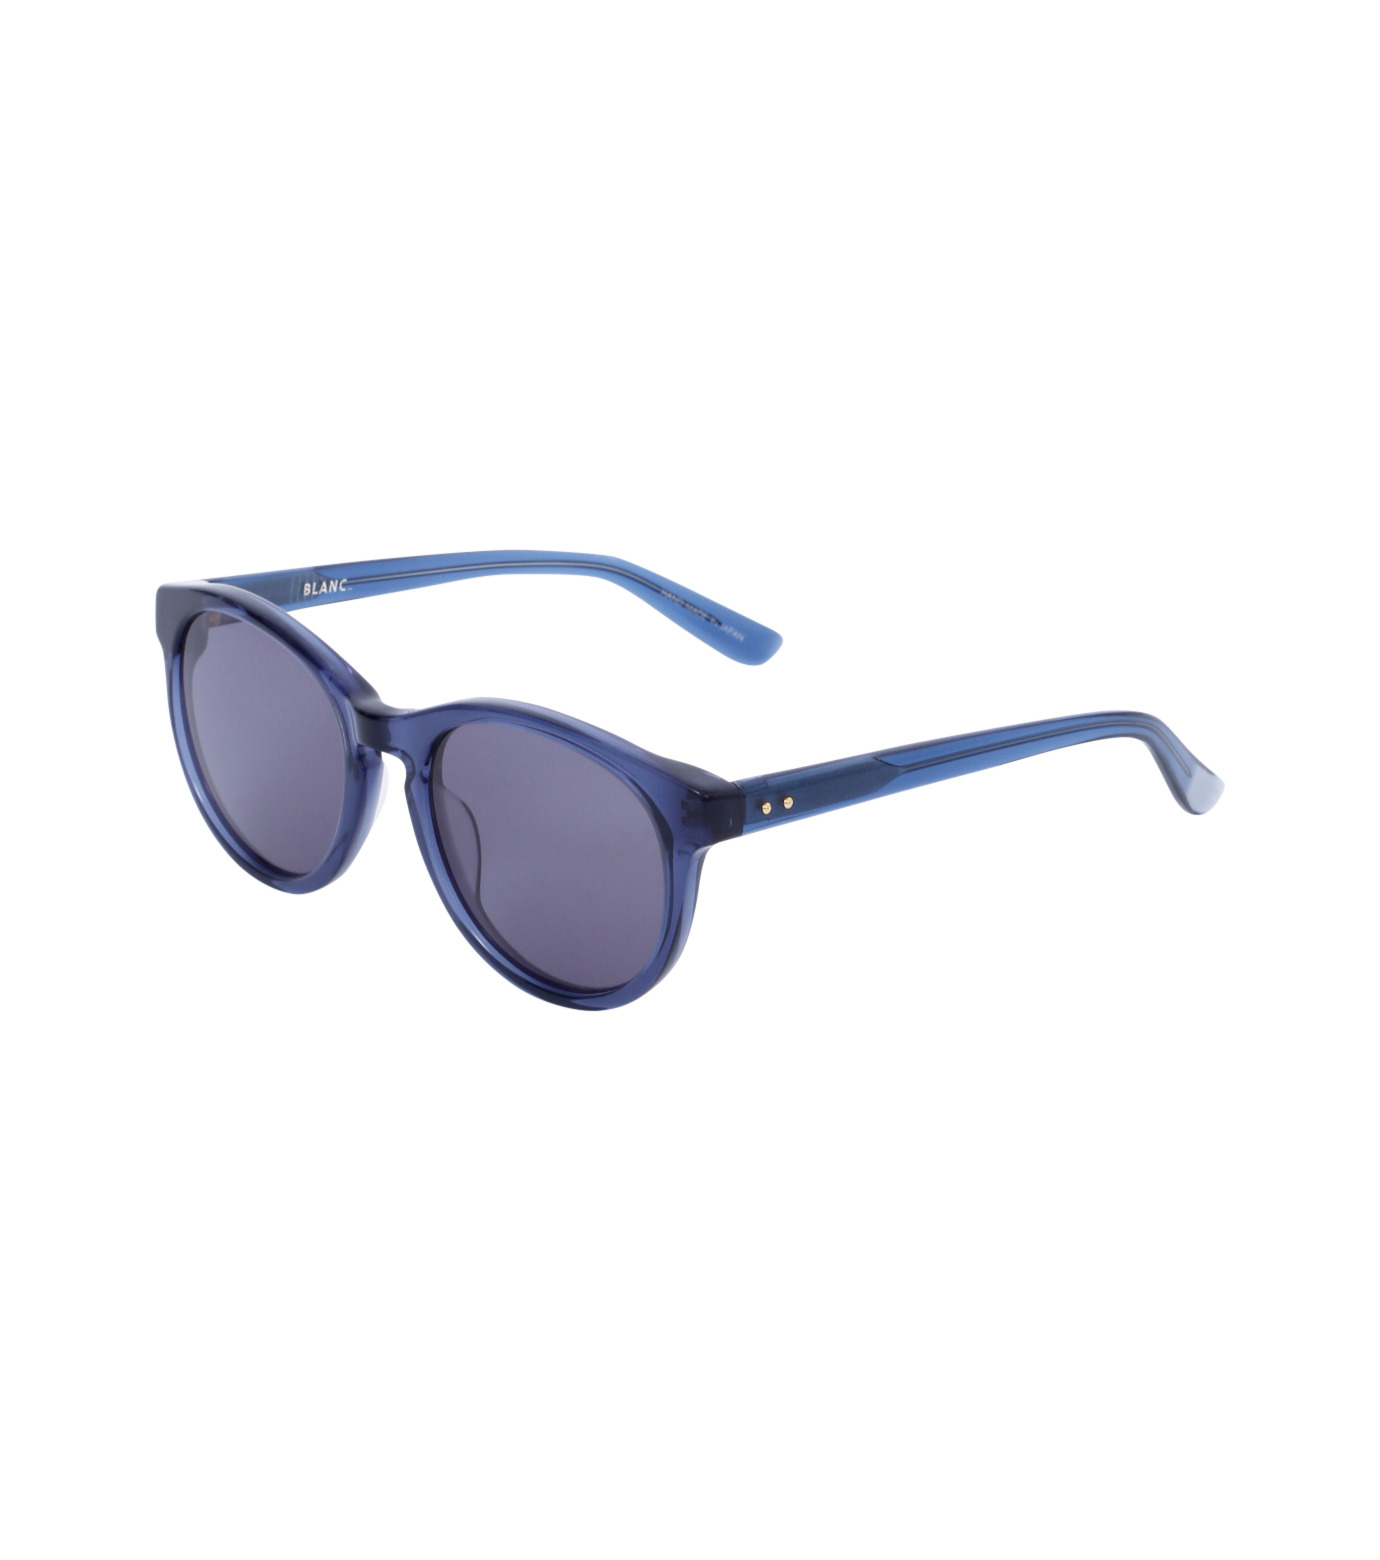 BLANC(ブラン)のOval Frame Sunglass-BLUE(アイウェア/eyewear)-B0005-92 拡大詳細画像1